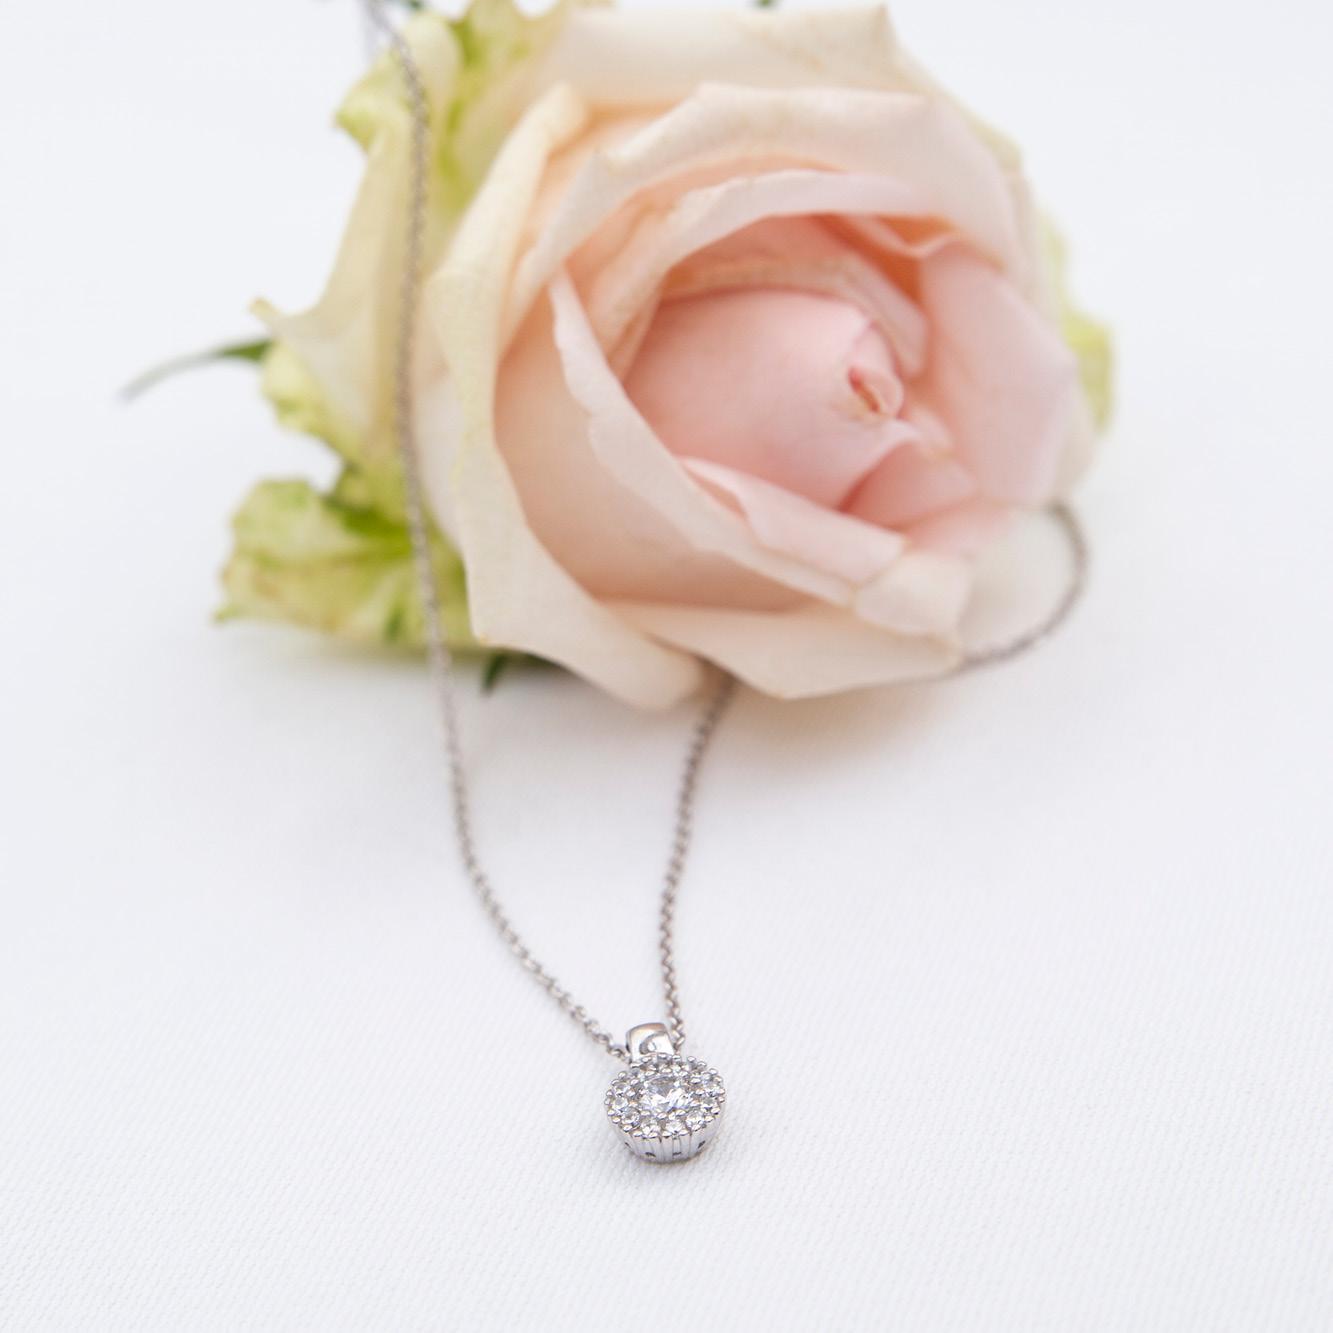 Damen Halskette Silber 925 Zirkonia